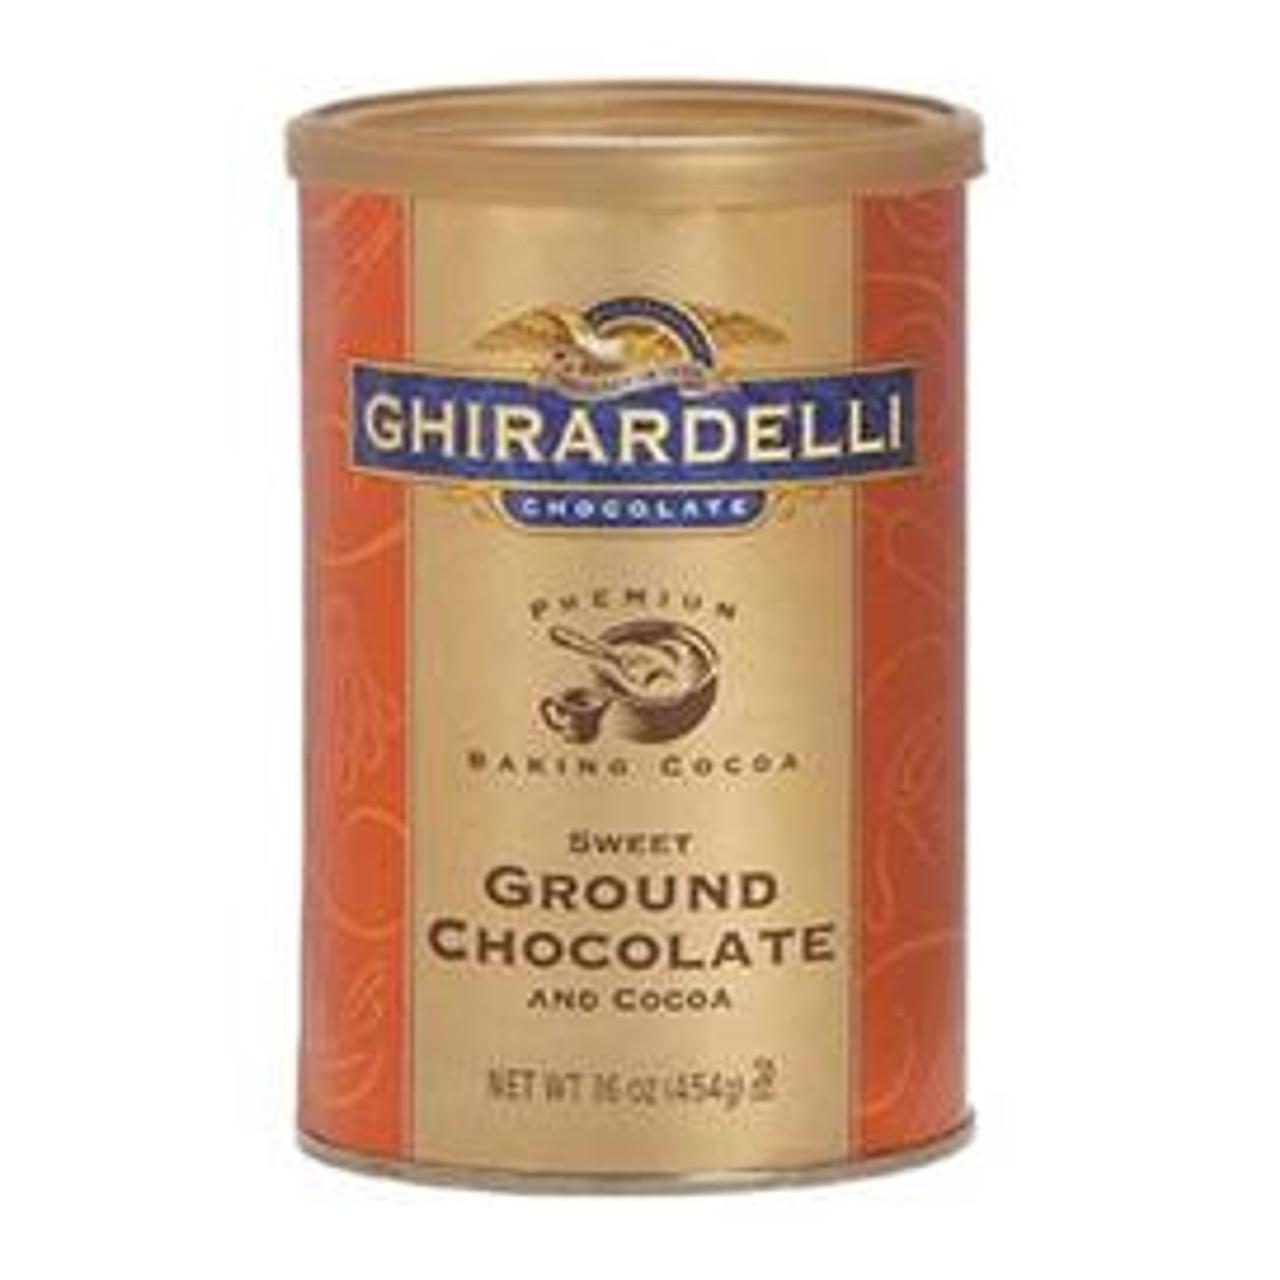 Sweet Ground Chocolate & Cocoa